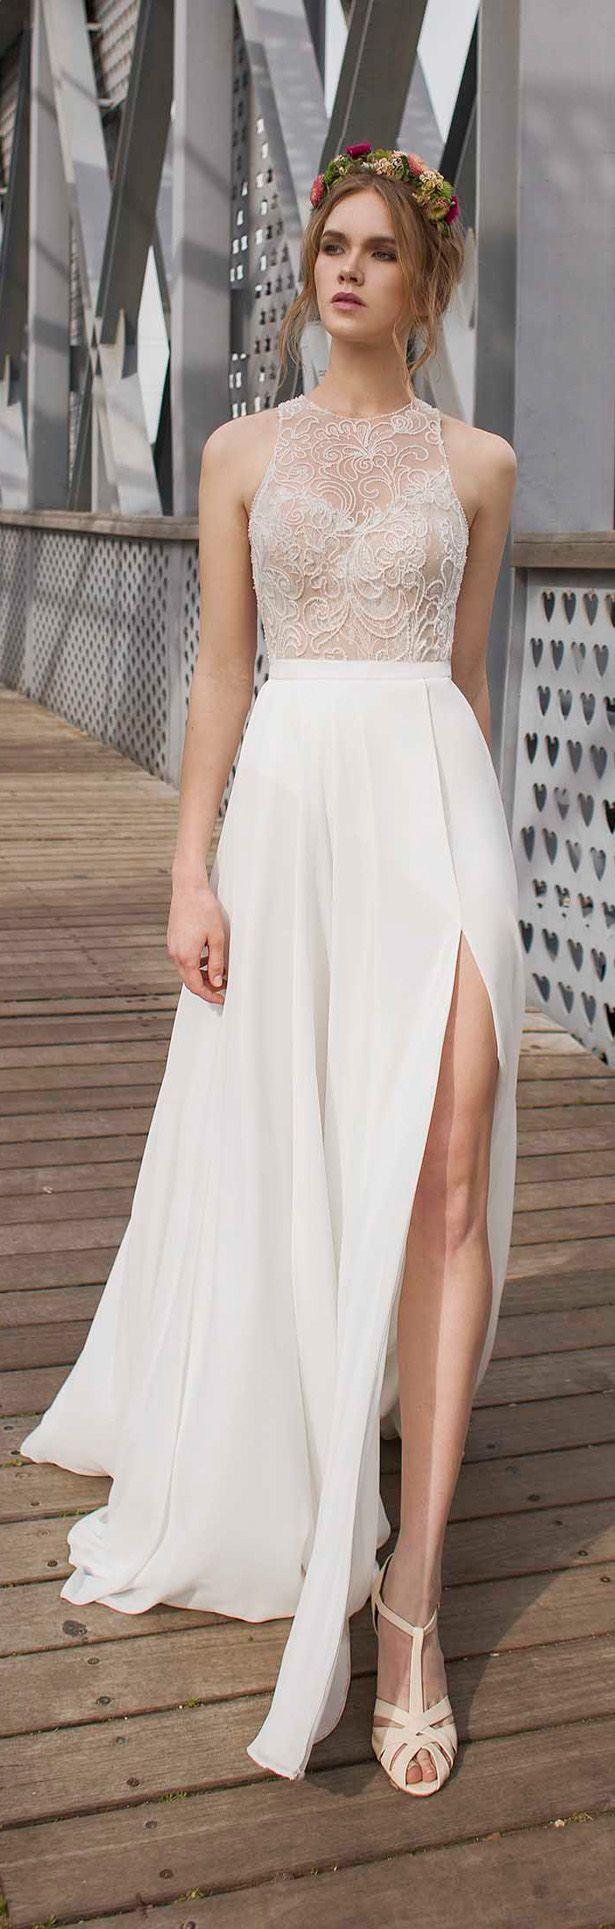 civil wedding dresses limor rosen wedding dress - olivia DLAAPGU